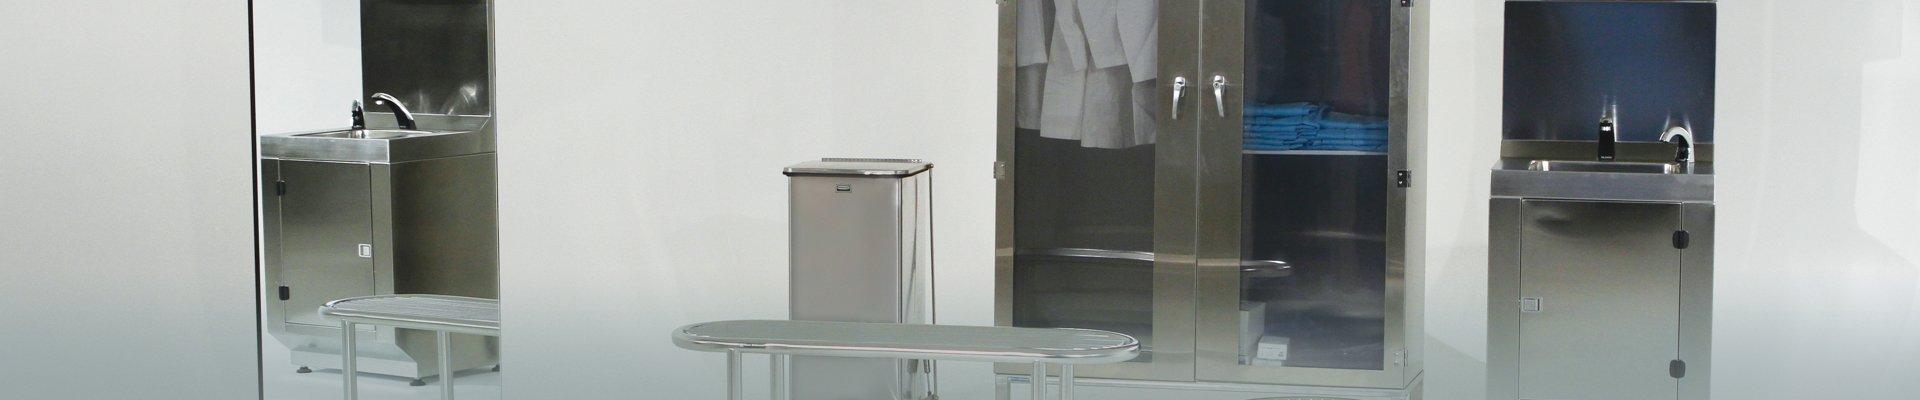 Cleanroom Equipment & Furnishings